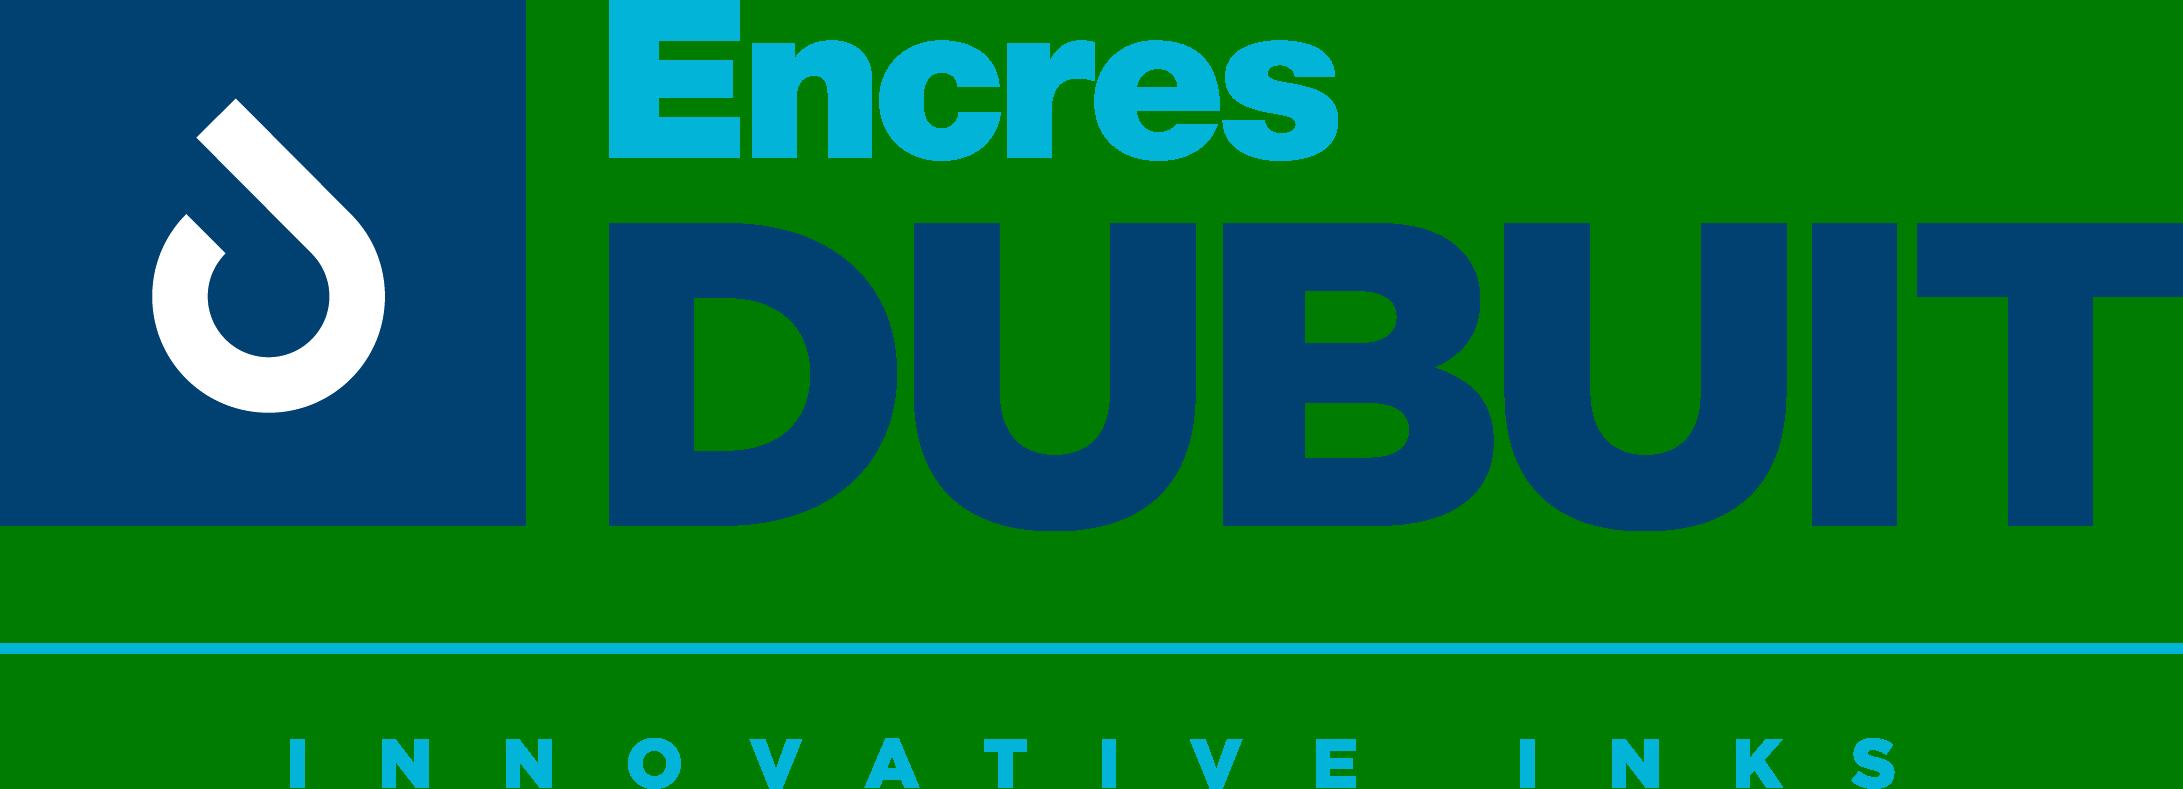 ENCRES-DUBUIT-INKS-LOGO